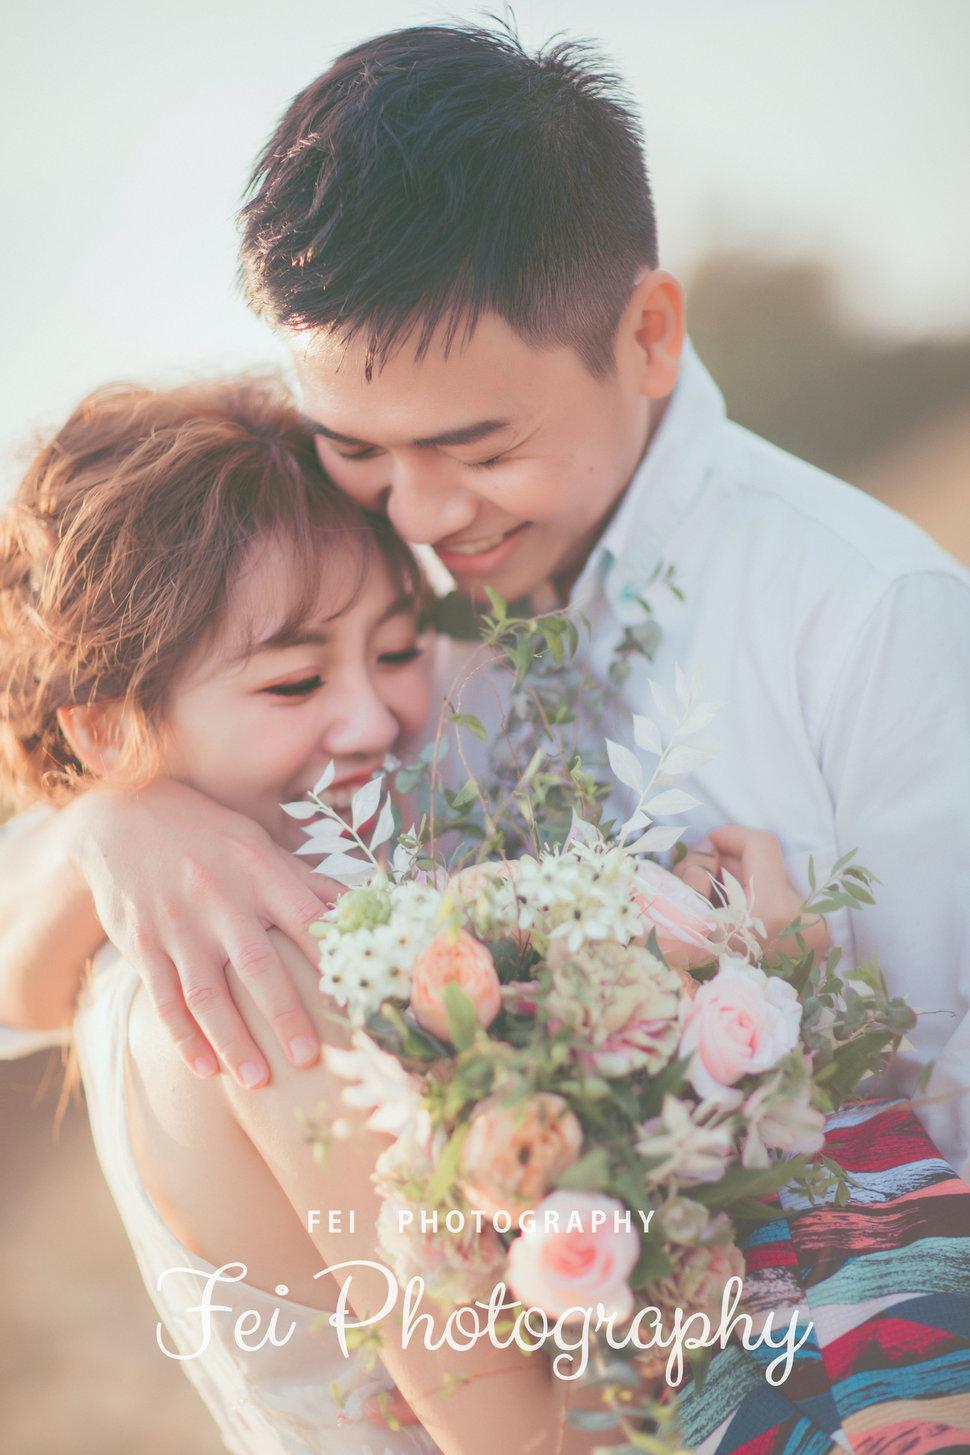 45 - 飛妃 Photography/女攝影師《結婚吧》